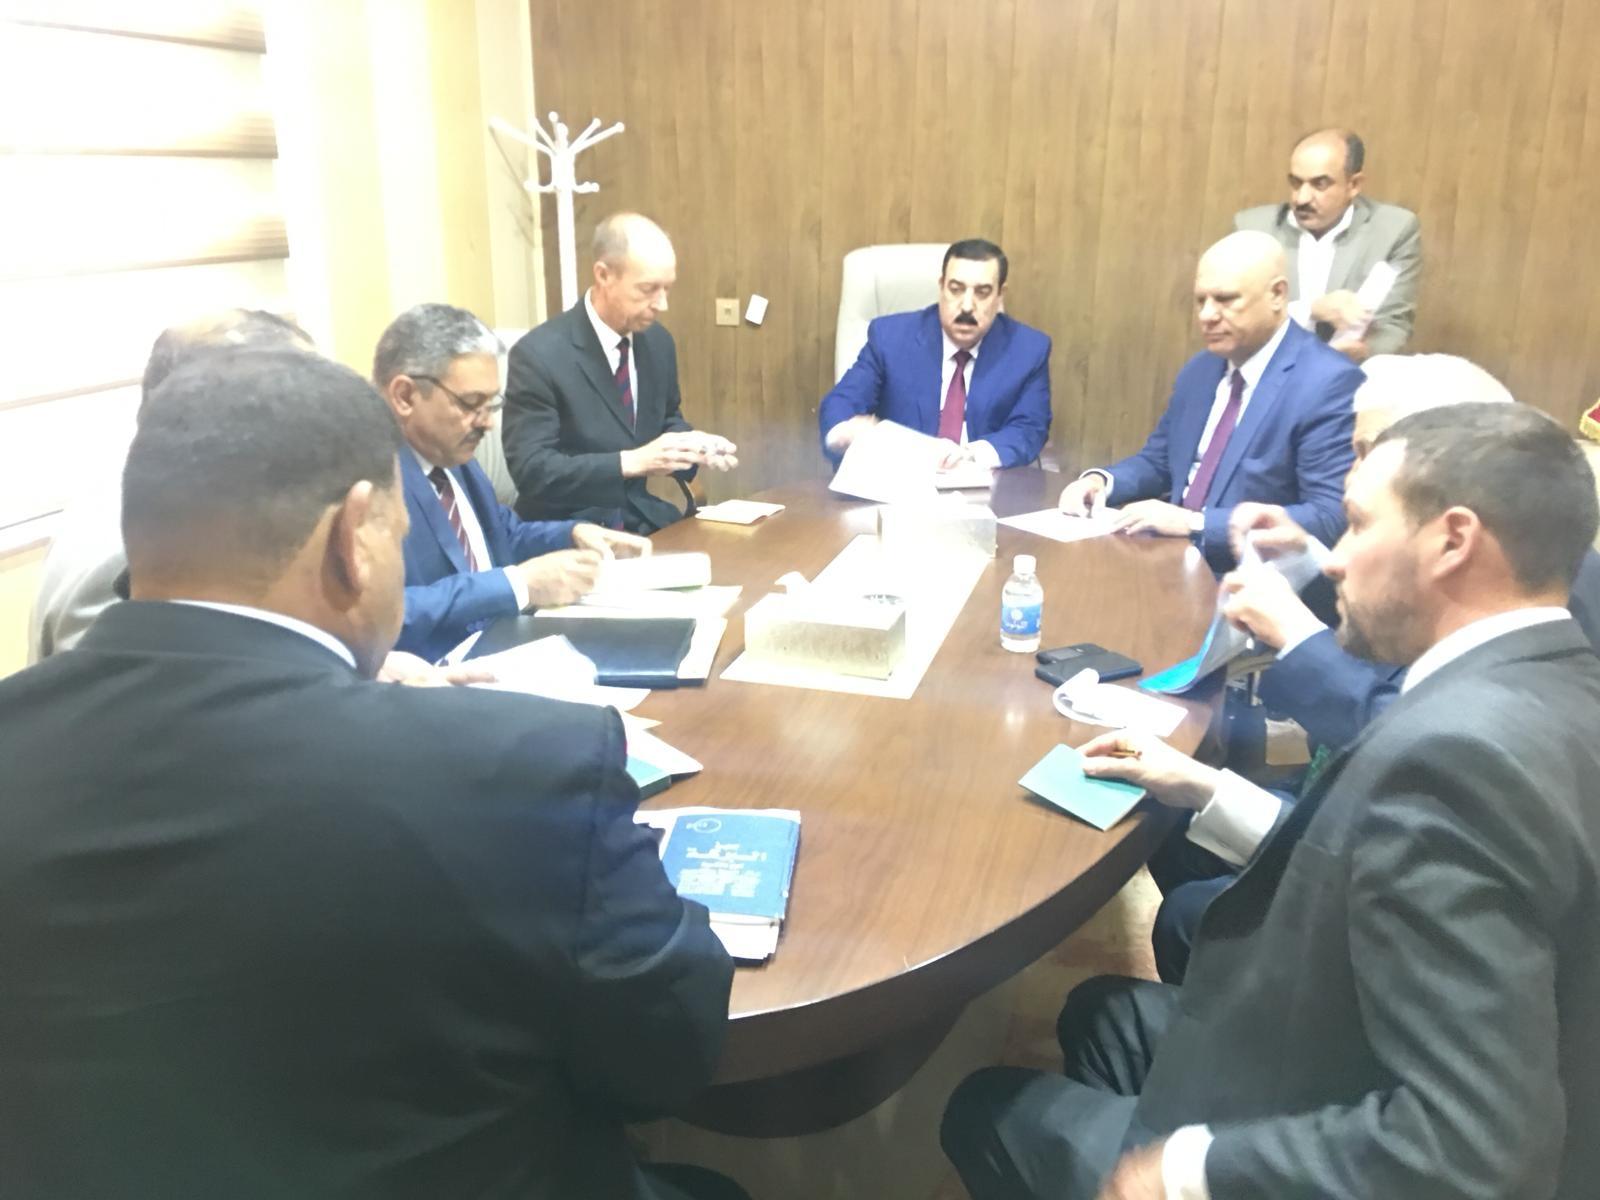 IBBC visits Ramadi (Anbar Province) and Baghdad Cf0aa26e-39f3-4531-8b60-8677cfa015b6